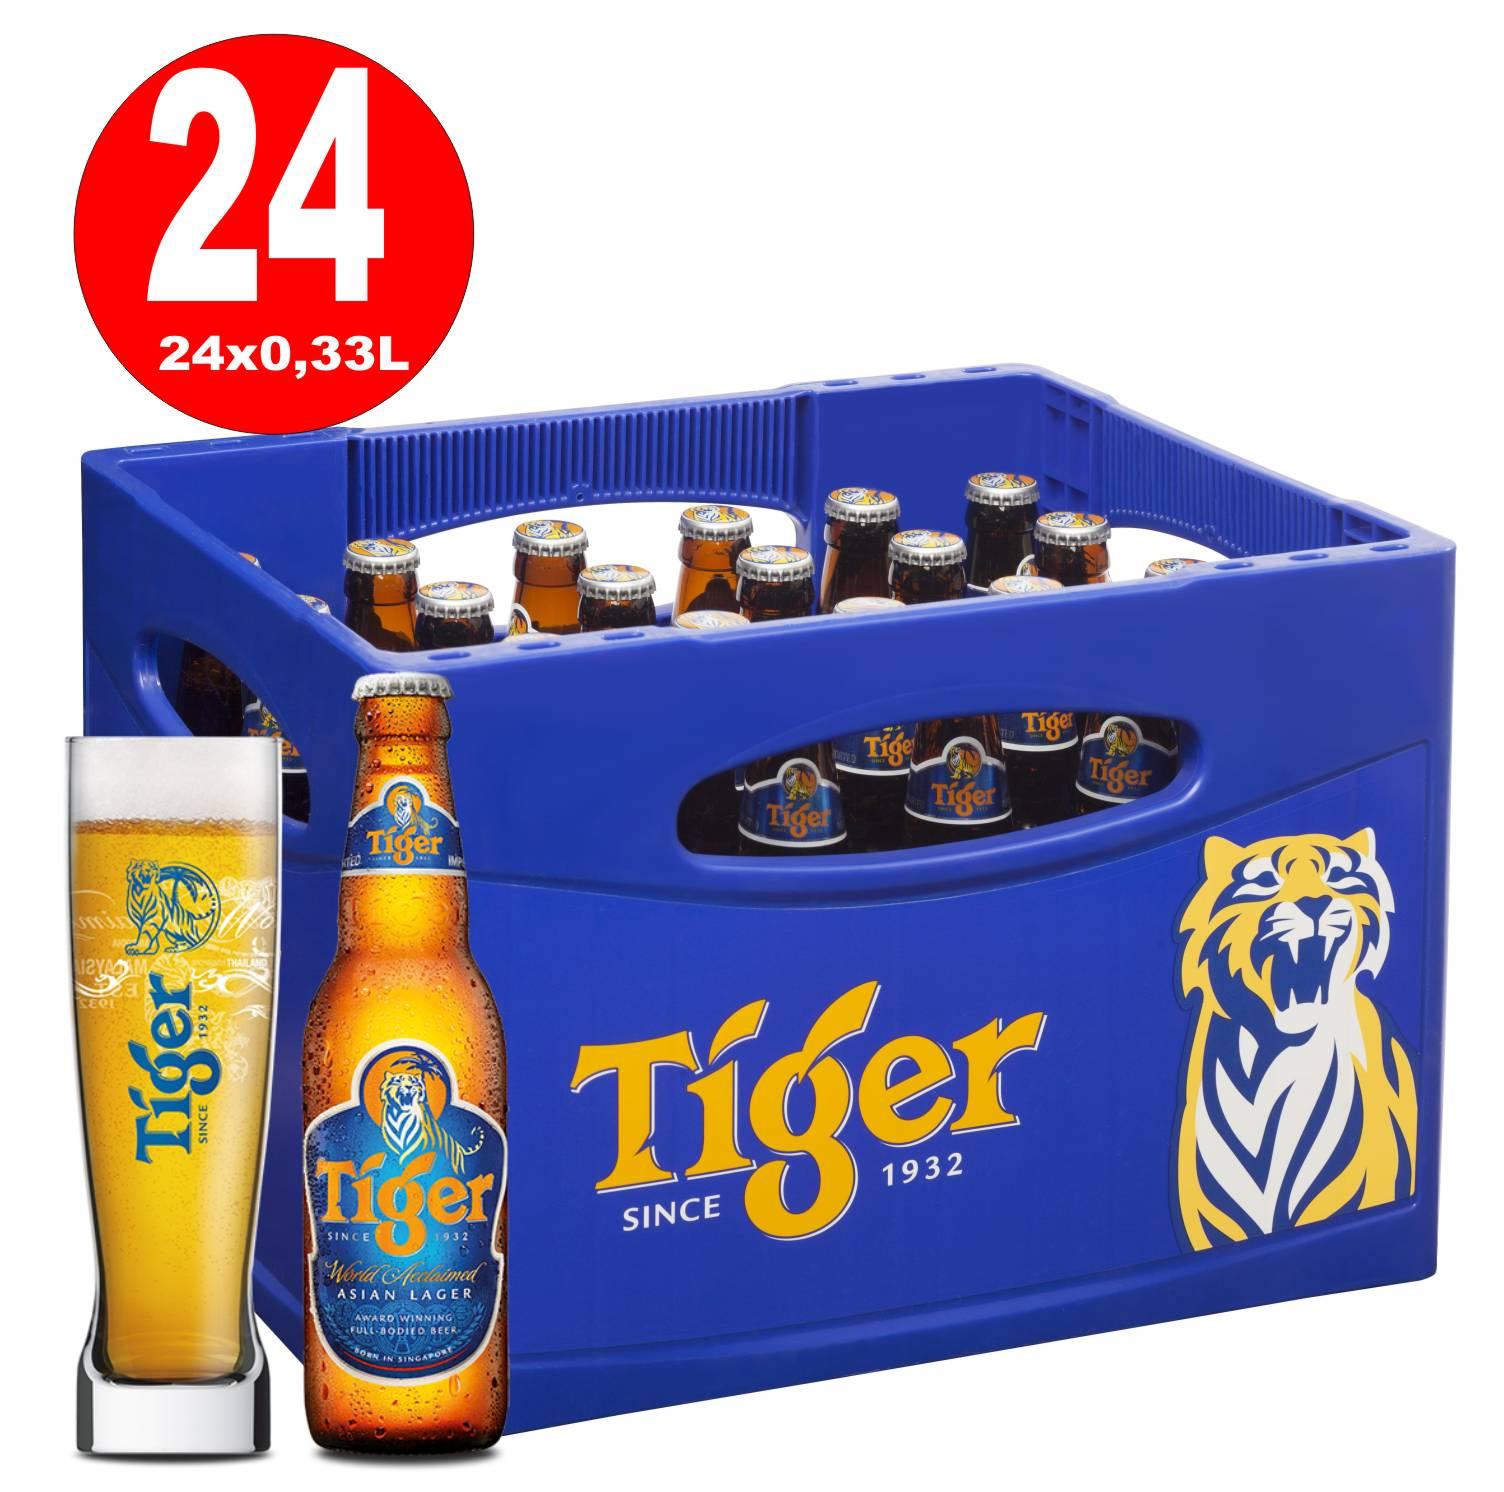 24 x Tiger Beer Original Asia 0 33L Original Box 0 33L Bottle 5 0% vol   MULTIPLE